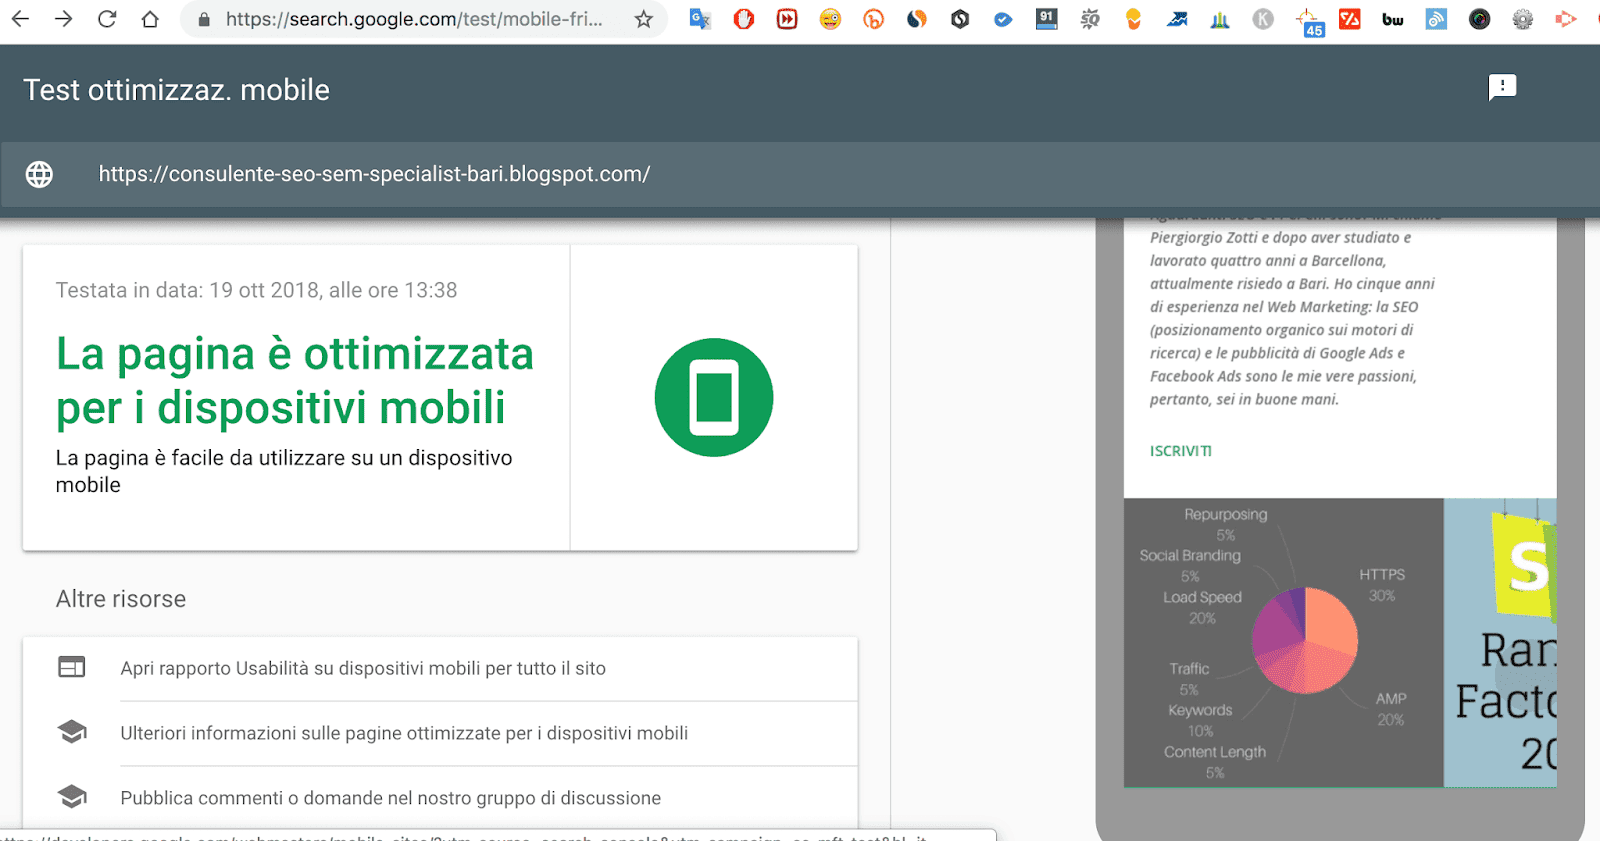 google mobile test SEO tool gratis